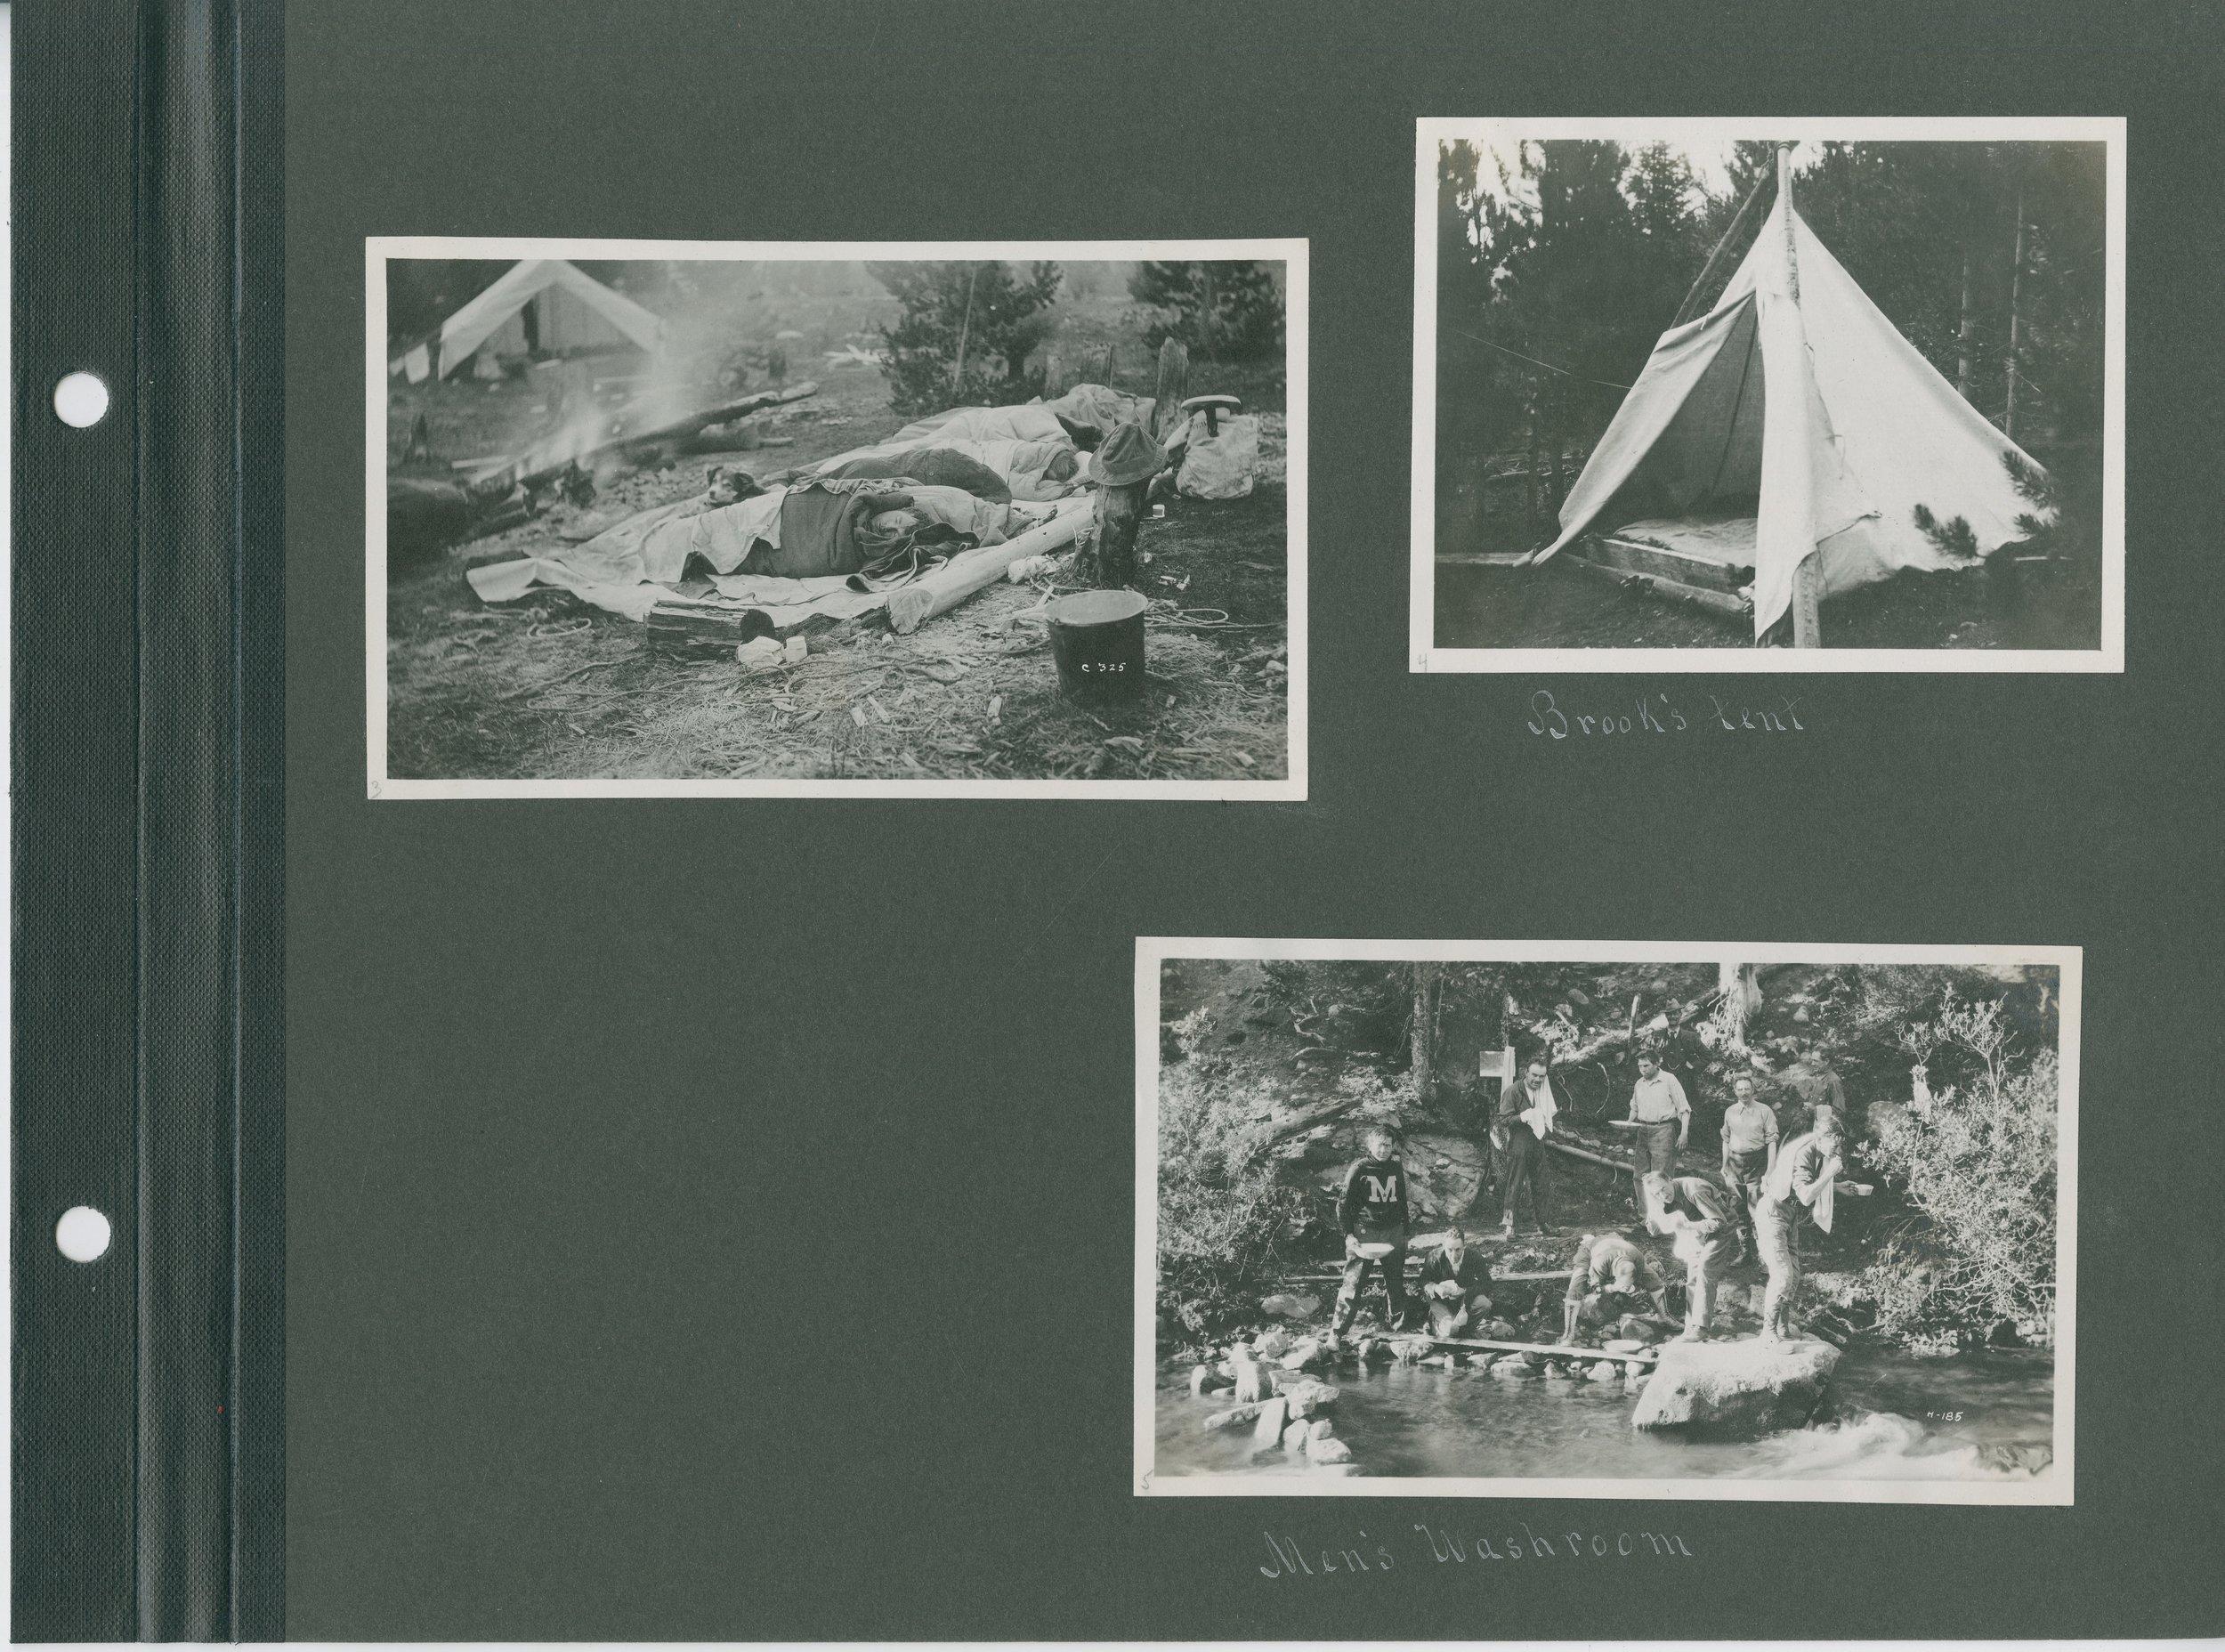 Top right: Brook's Tent, Bottom: Men's Washroom